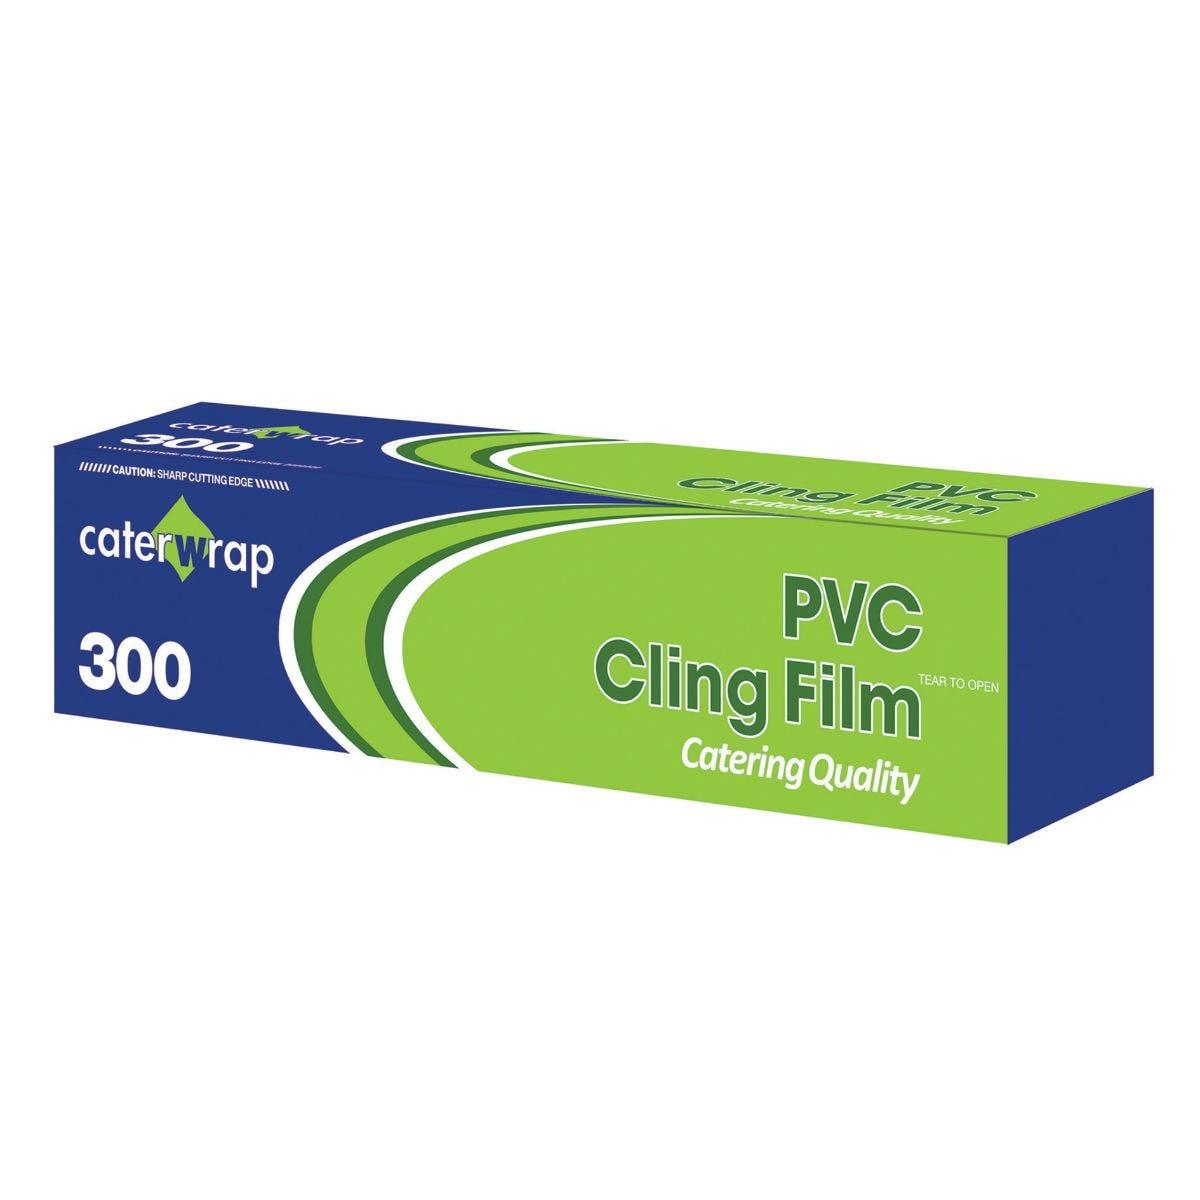 Caterwrap PVC Cling Film 30cm x 300m with Cutter Box